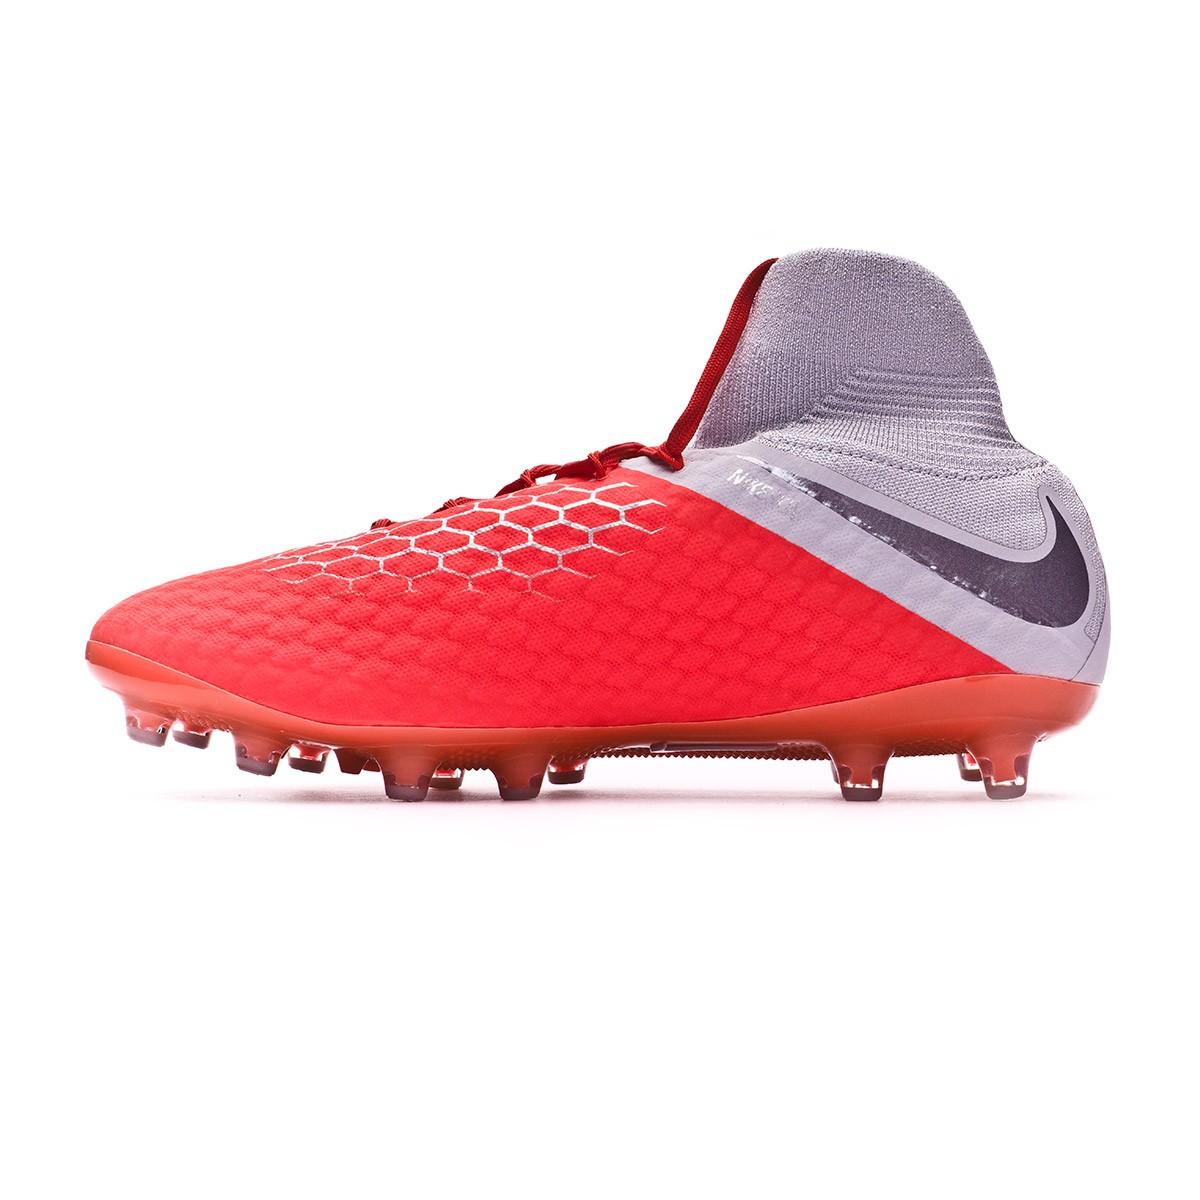 índice Izar Hacia atrás  Football Boots Nike Hypervenom Phantom III Pro DF AG-Pro Light  crimson-Metallic dark grey-Wolf grey - Football store Fútbol Emotion